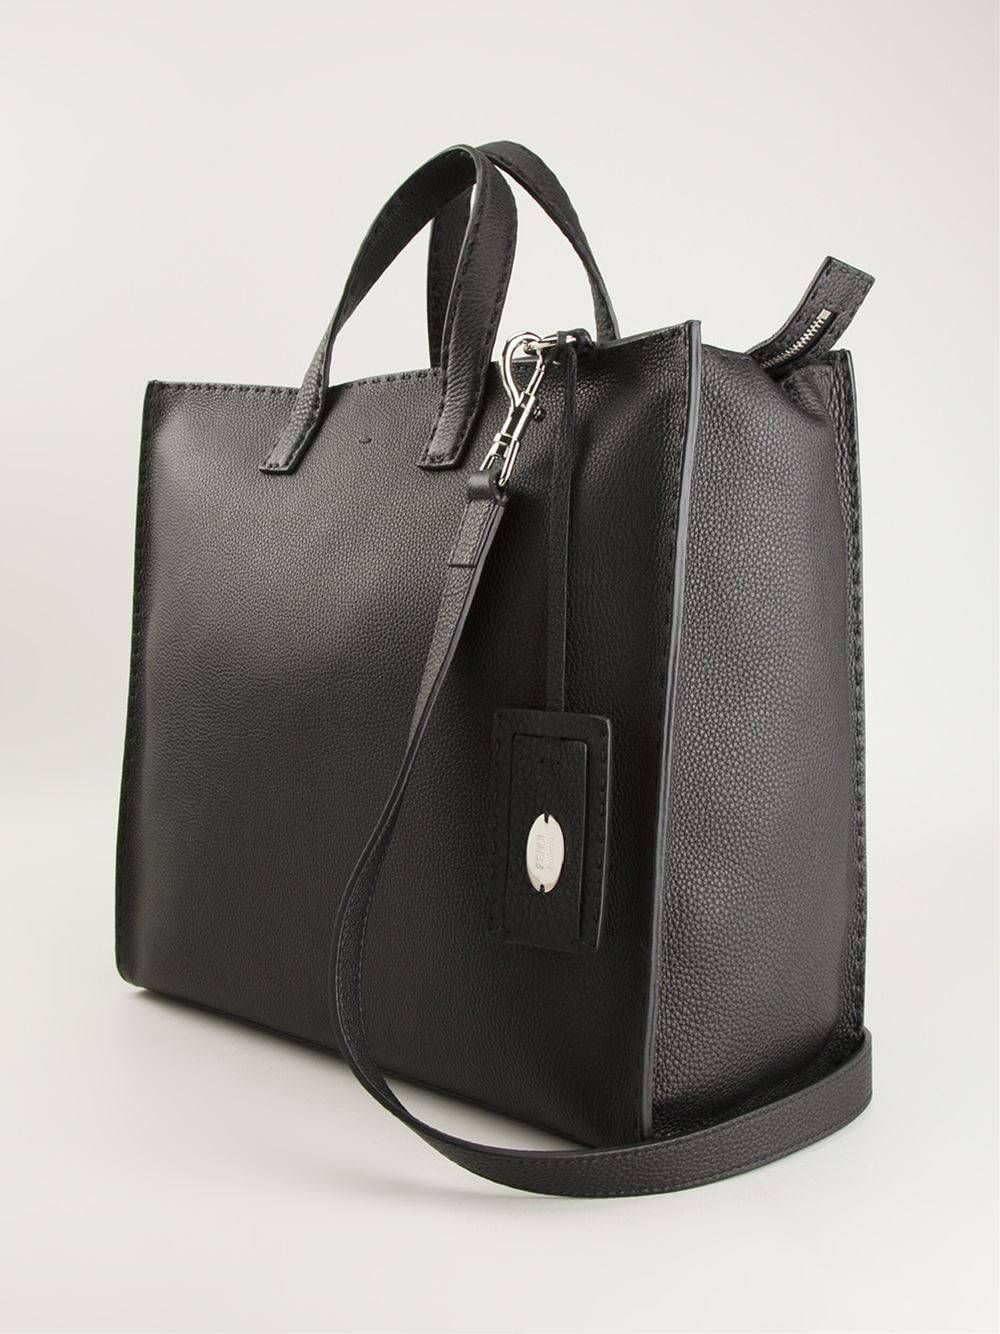 d7b6f112122d ... low cost lyst fendi selleria tote in black for men 59006 3003b ...